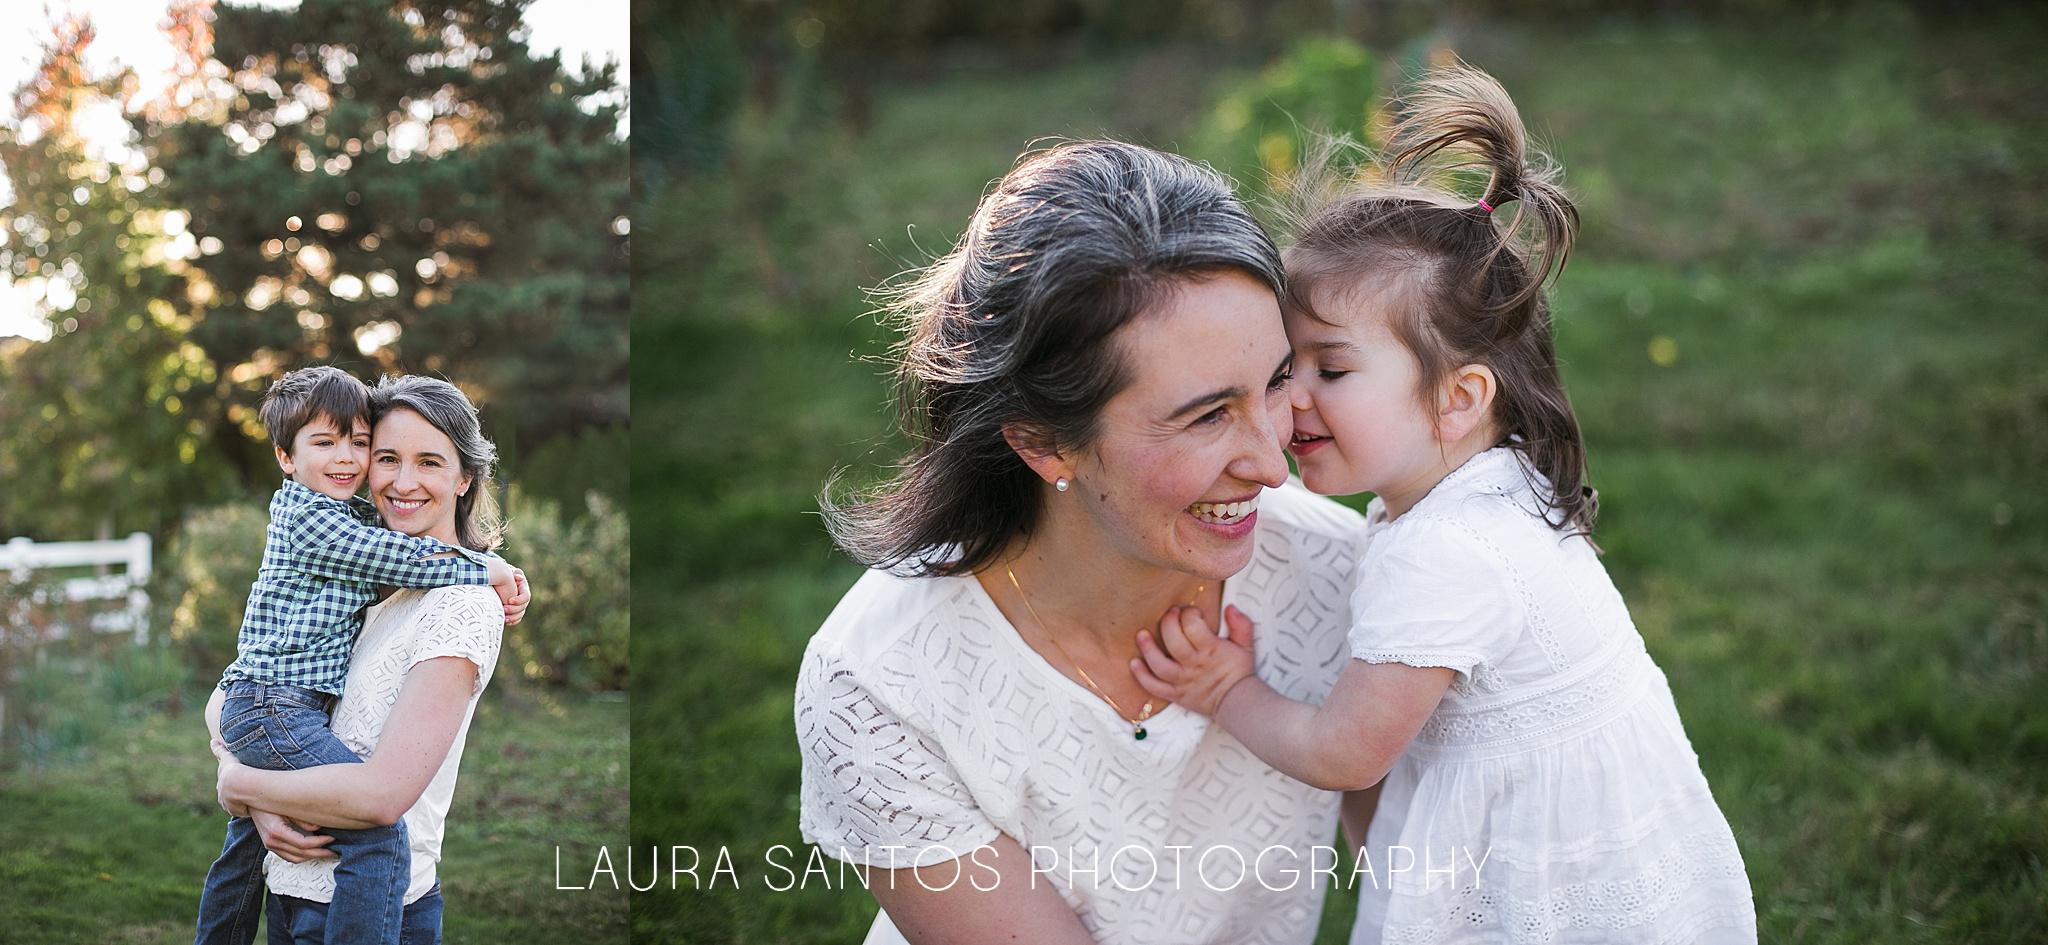 Laura Santos Photography Portland Oregon Family Photographer_0842.jpg